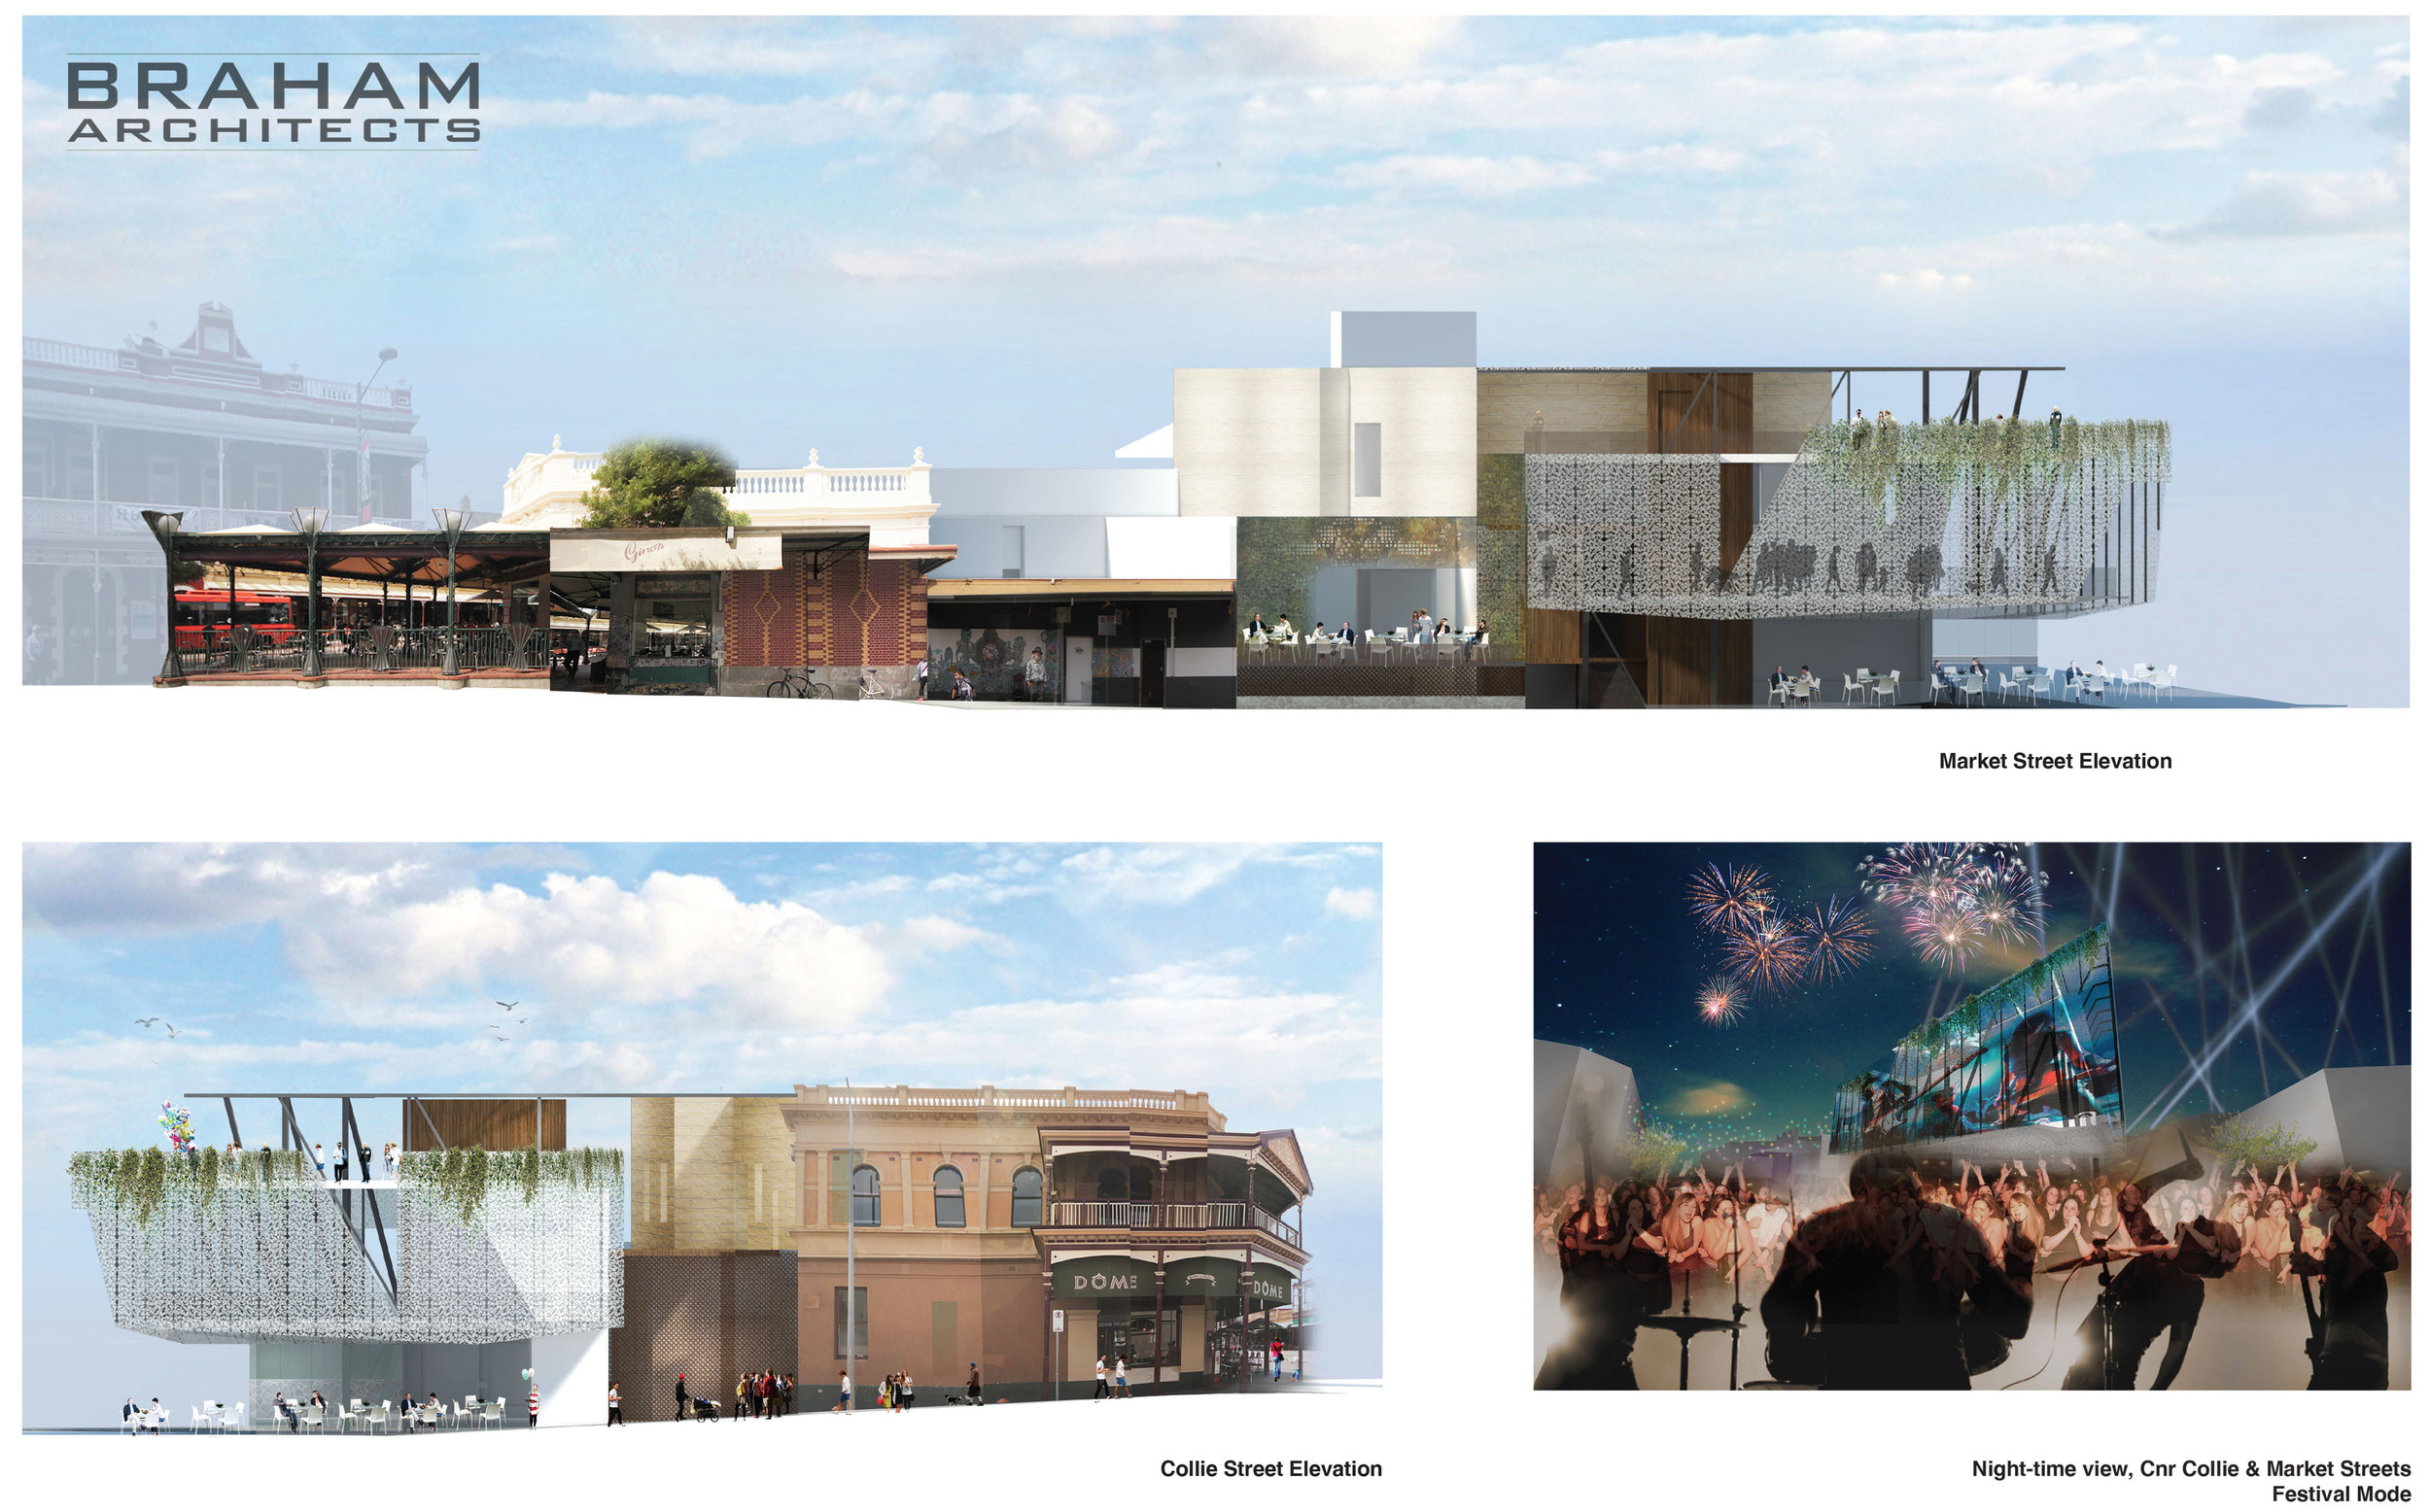 Braham-Architects-EvanDavies-ElevationsPage.jpg